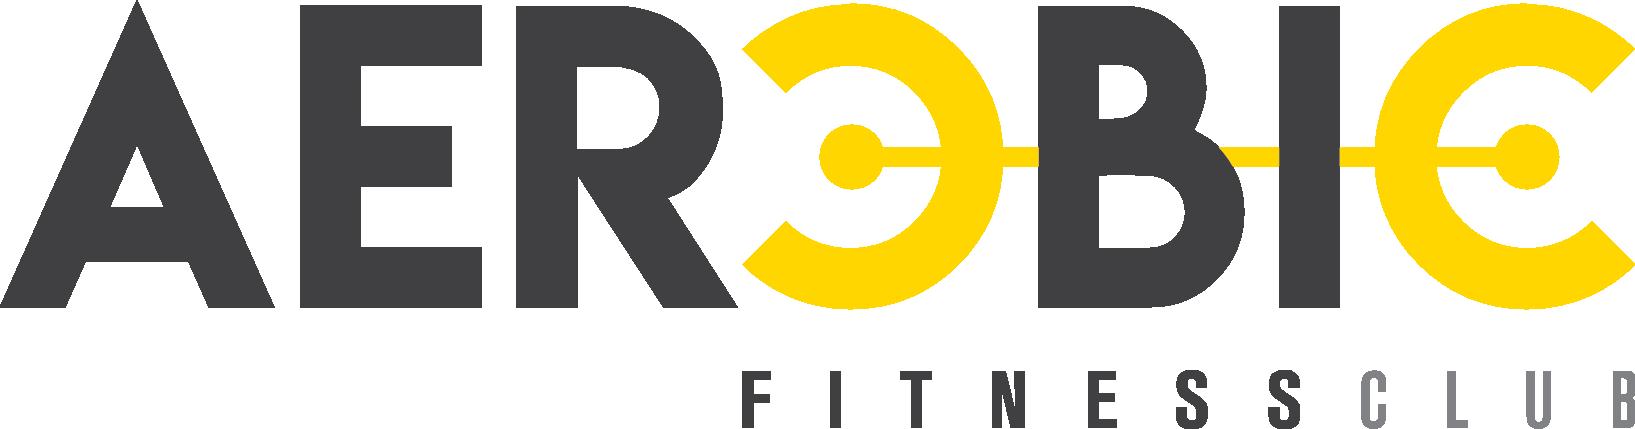 Aerobic.com.uy -  Instituto de Cultura Física